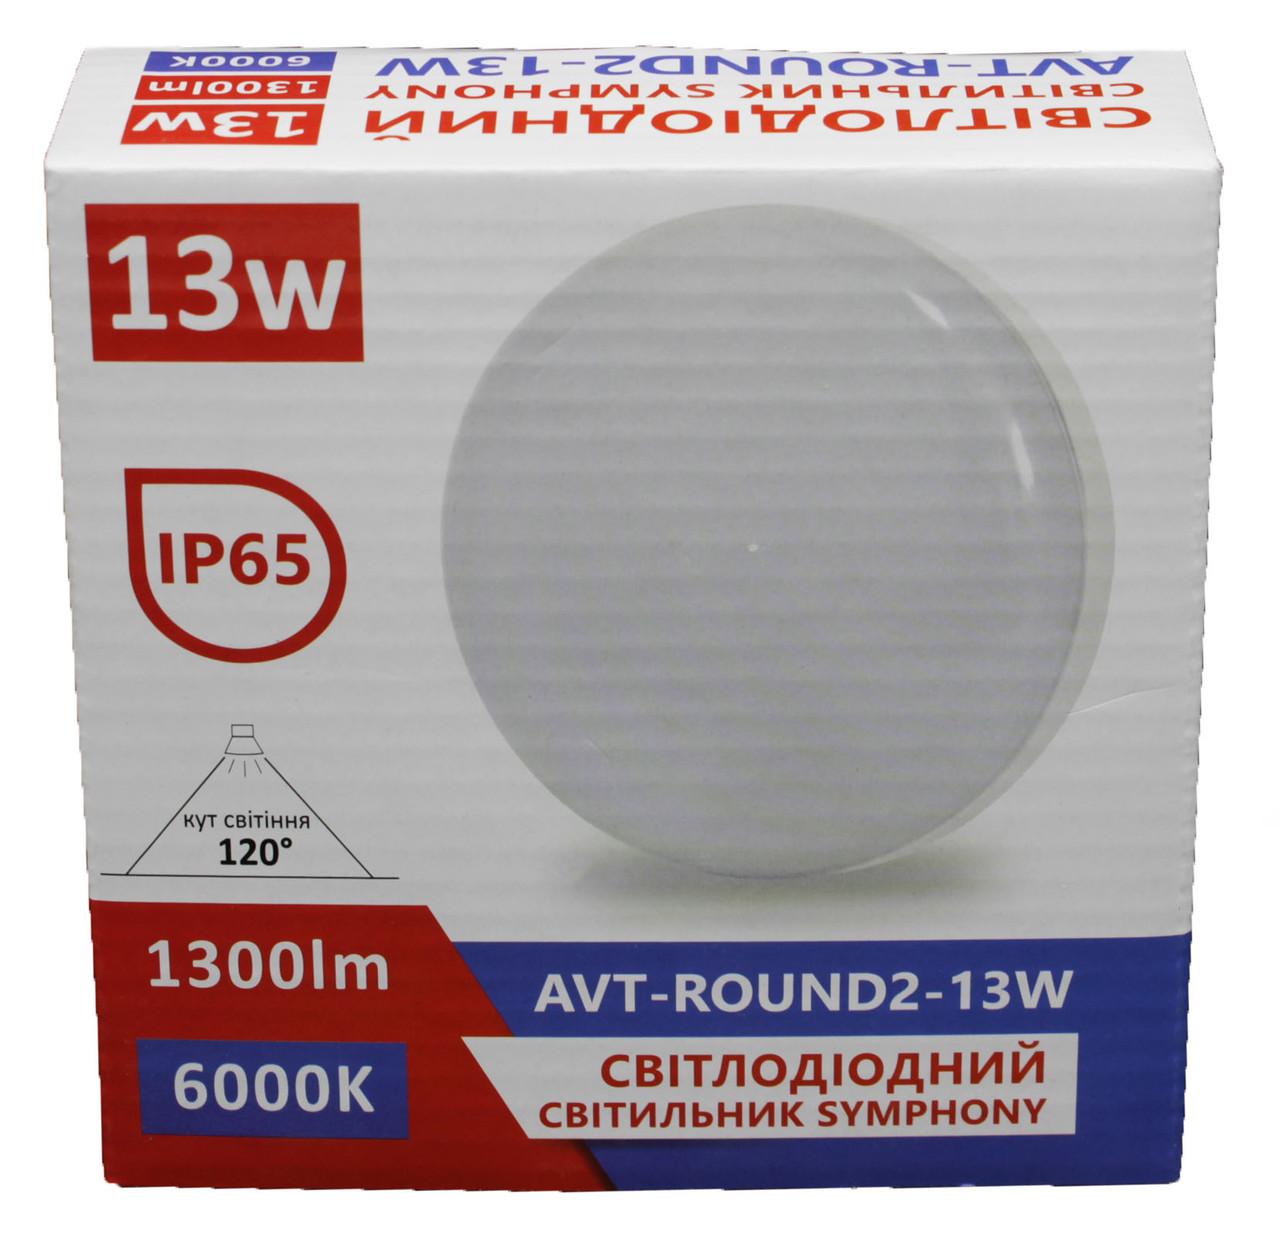 #107/1 AVT-ROUND2-13W-SYMPHONY Pure White Светодиодный светильник